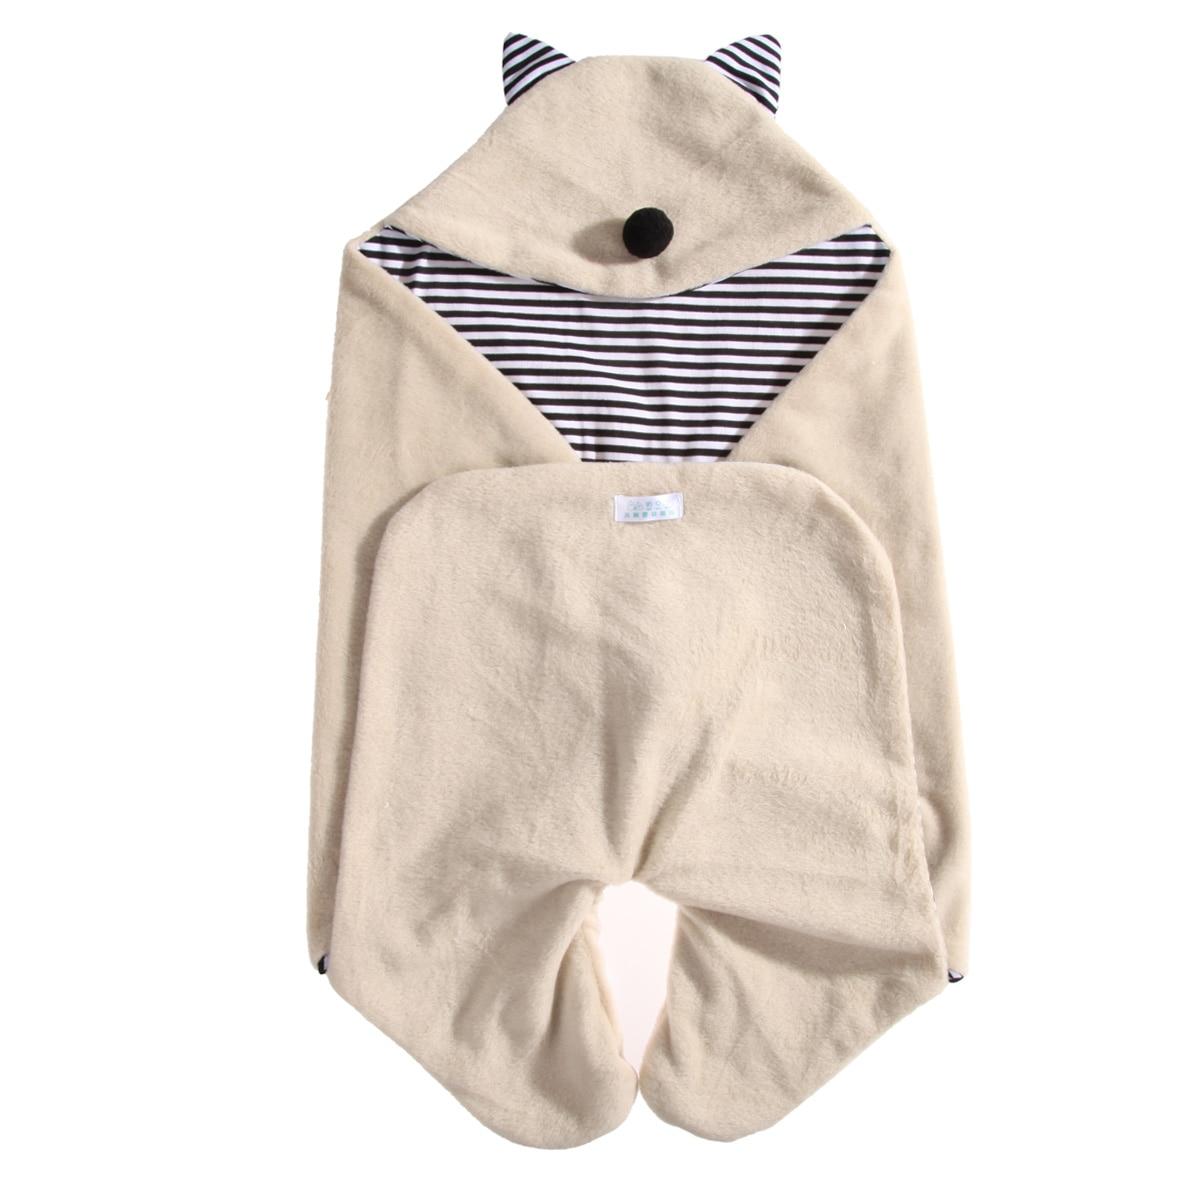 baby swaddle newborn blanket swaddle toddler sleeping bag sleepsack stroller wrap newborn blanket swaddle quilt